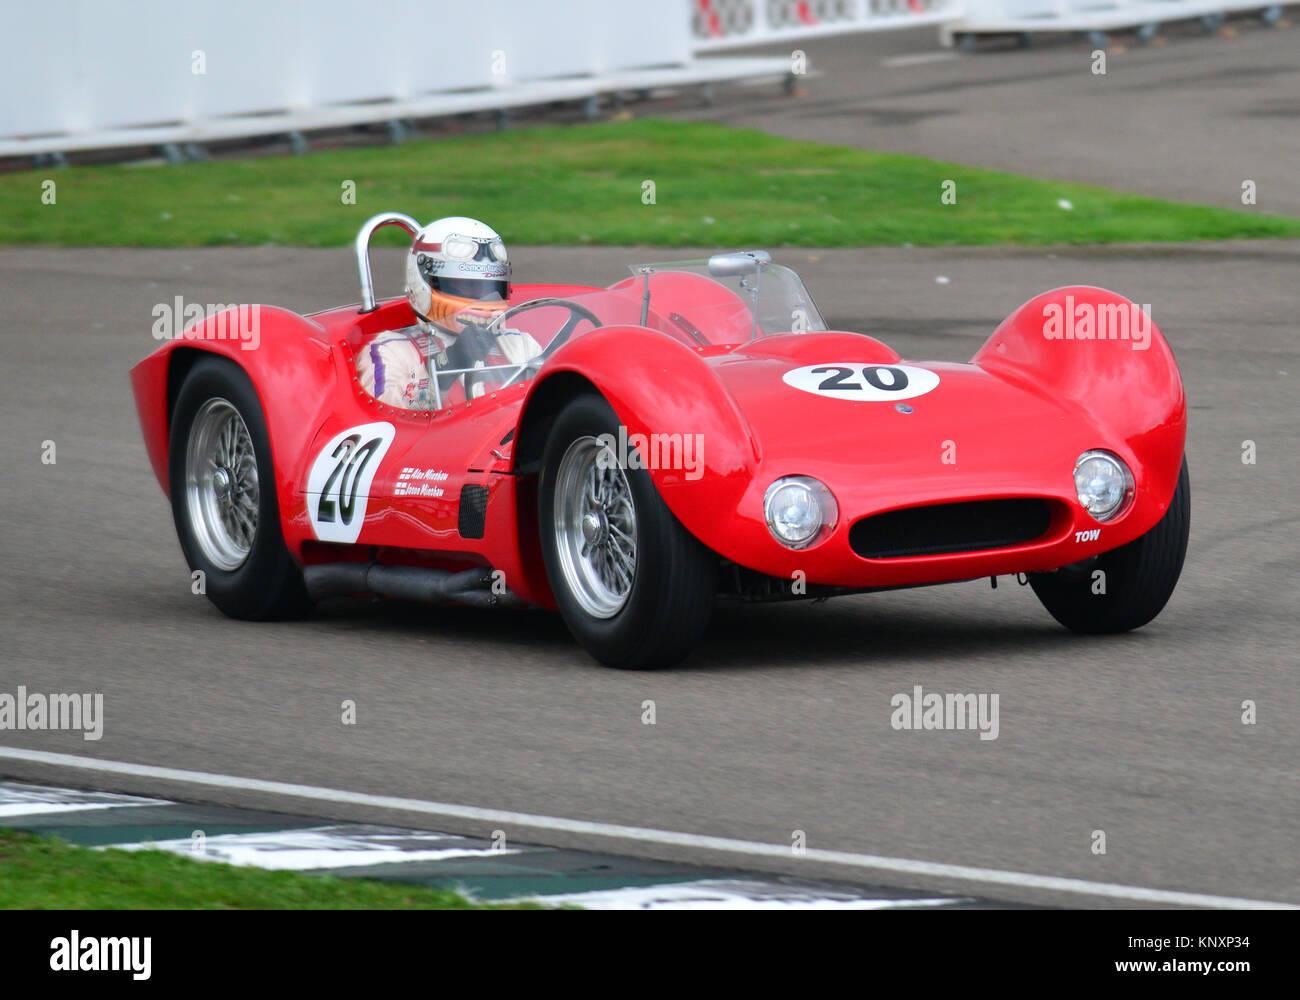 Goodwood Classic Car Show